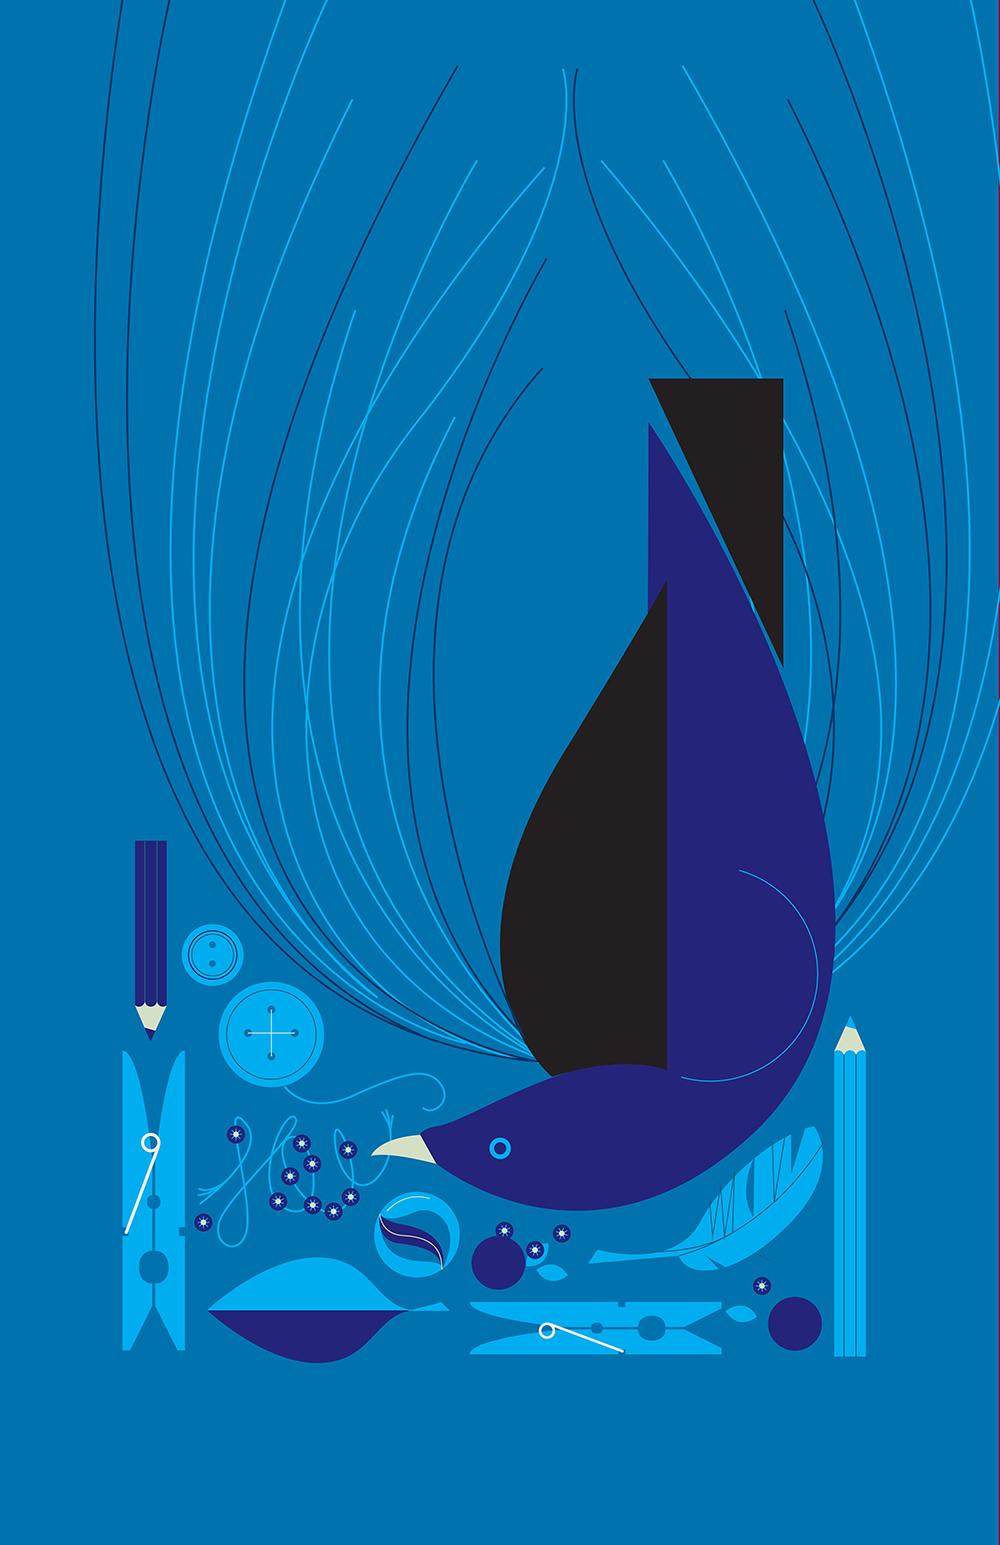 Blue Bowerbird